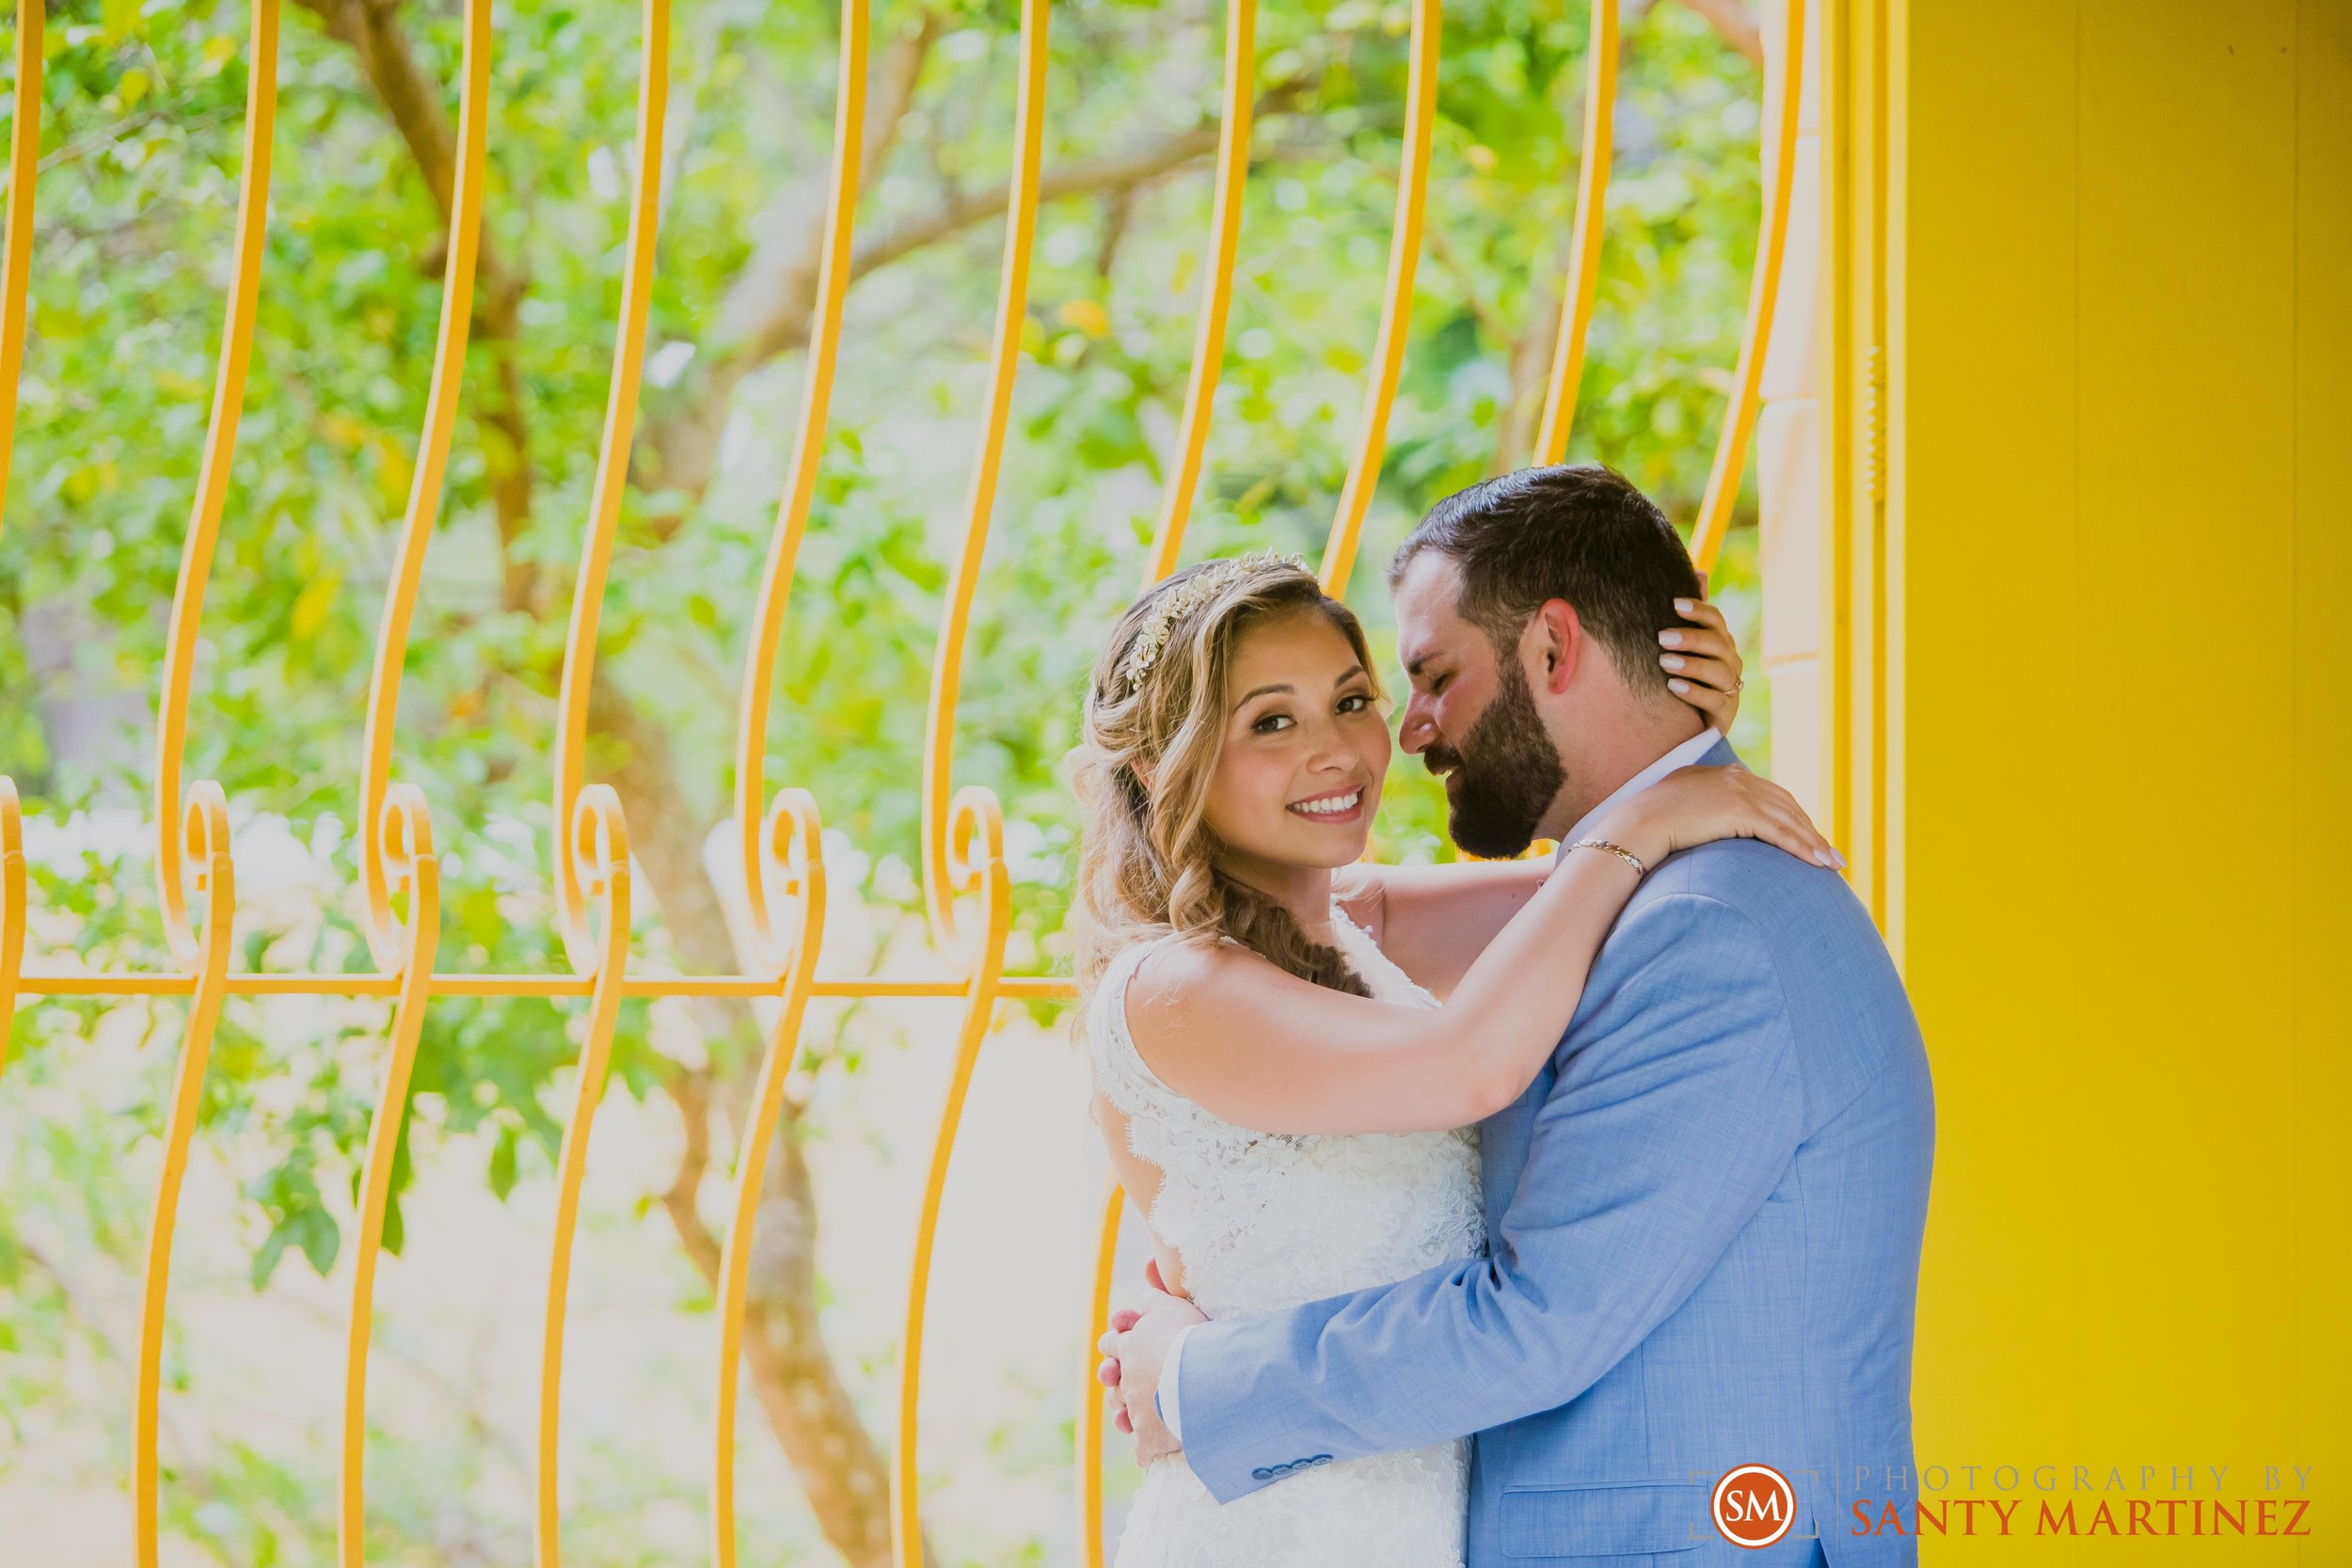 Wedding Bonnet House - Santy Martinez Photography-25.jpg